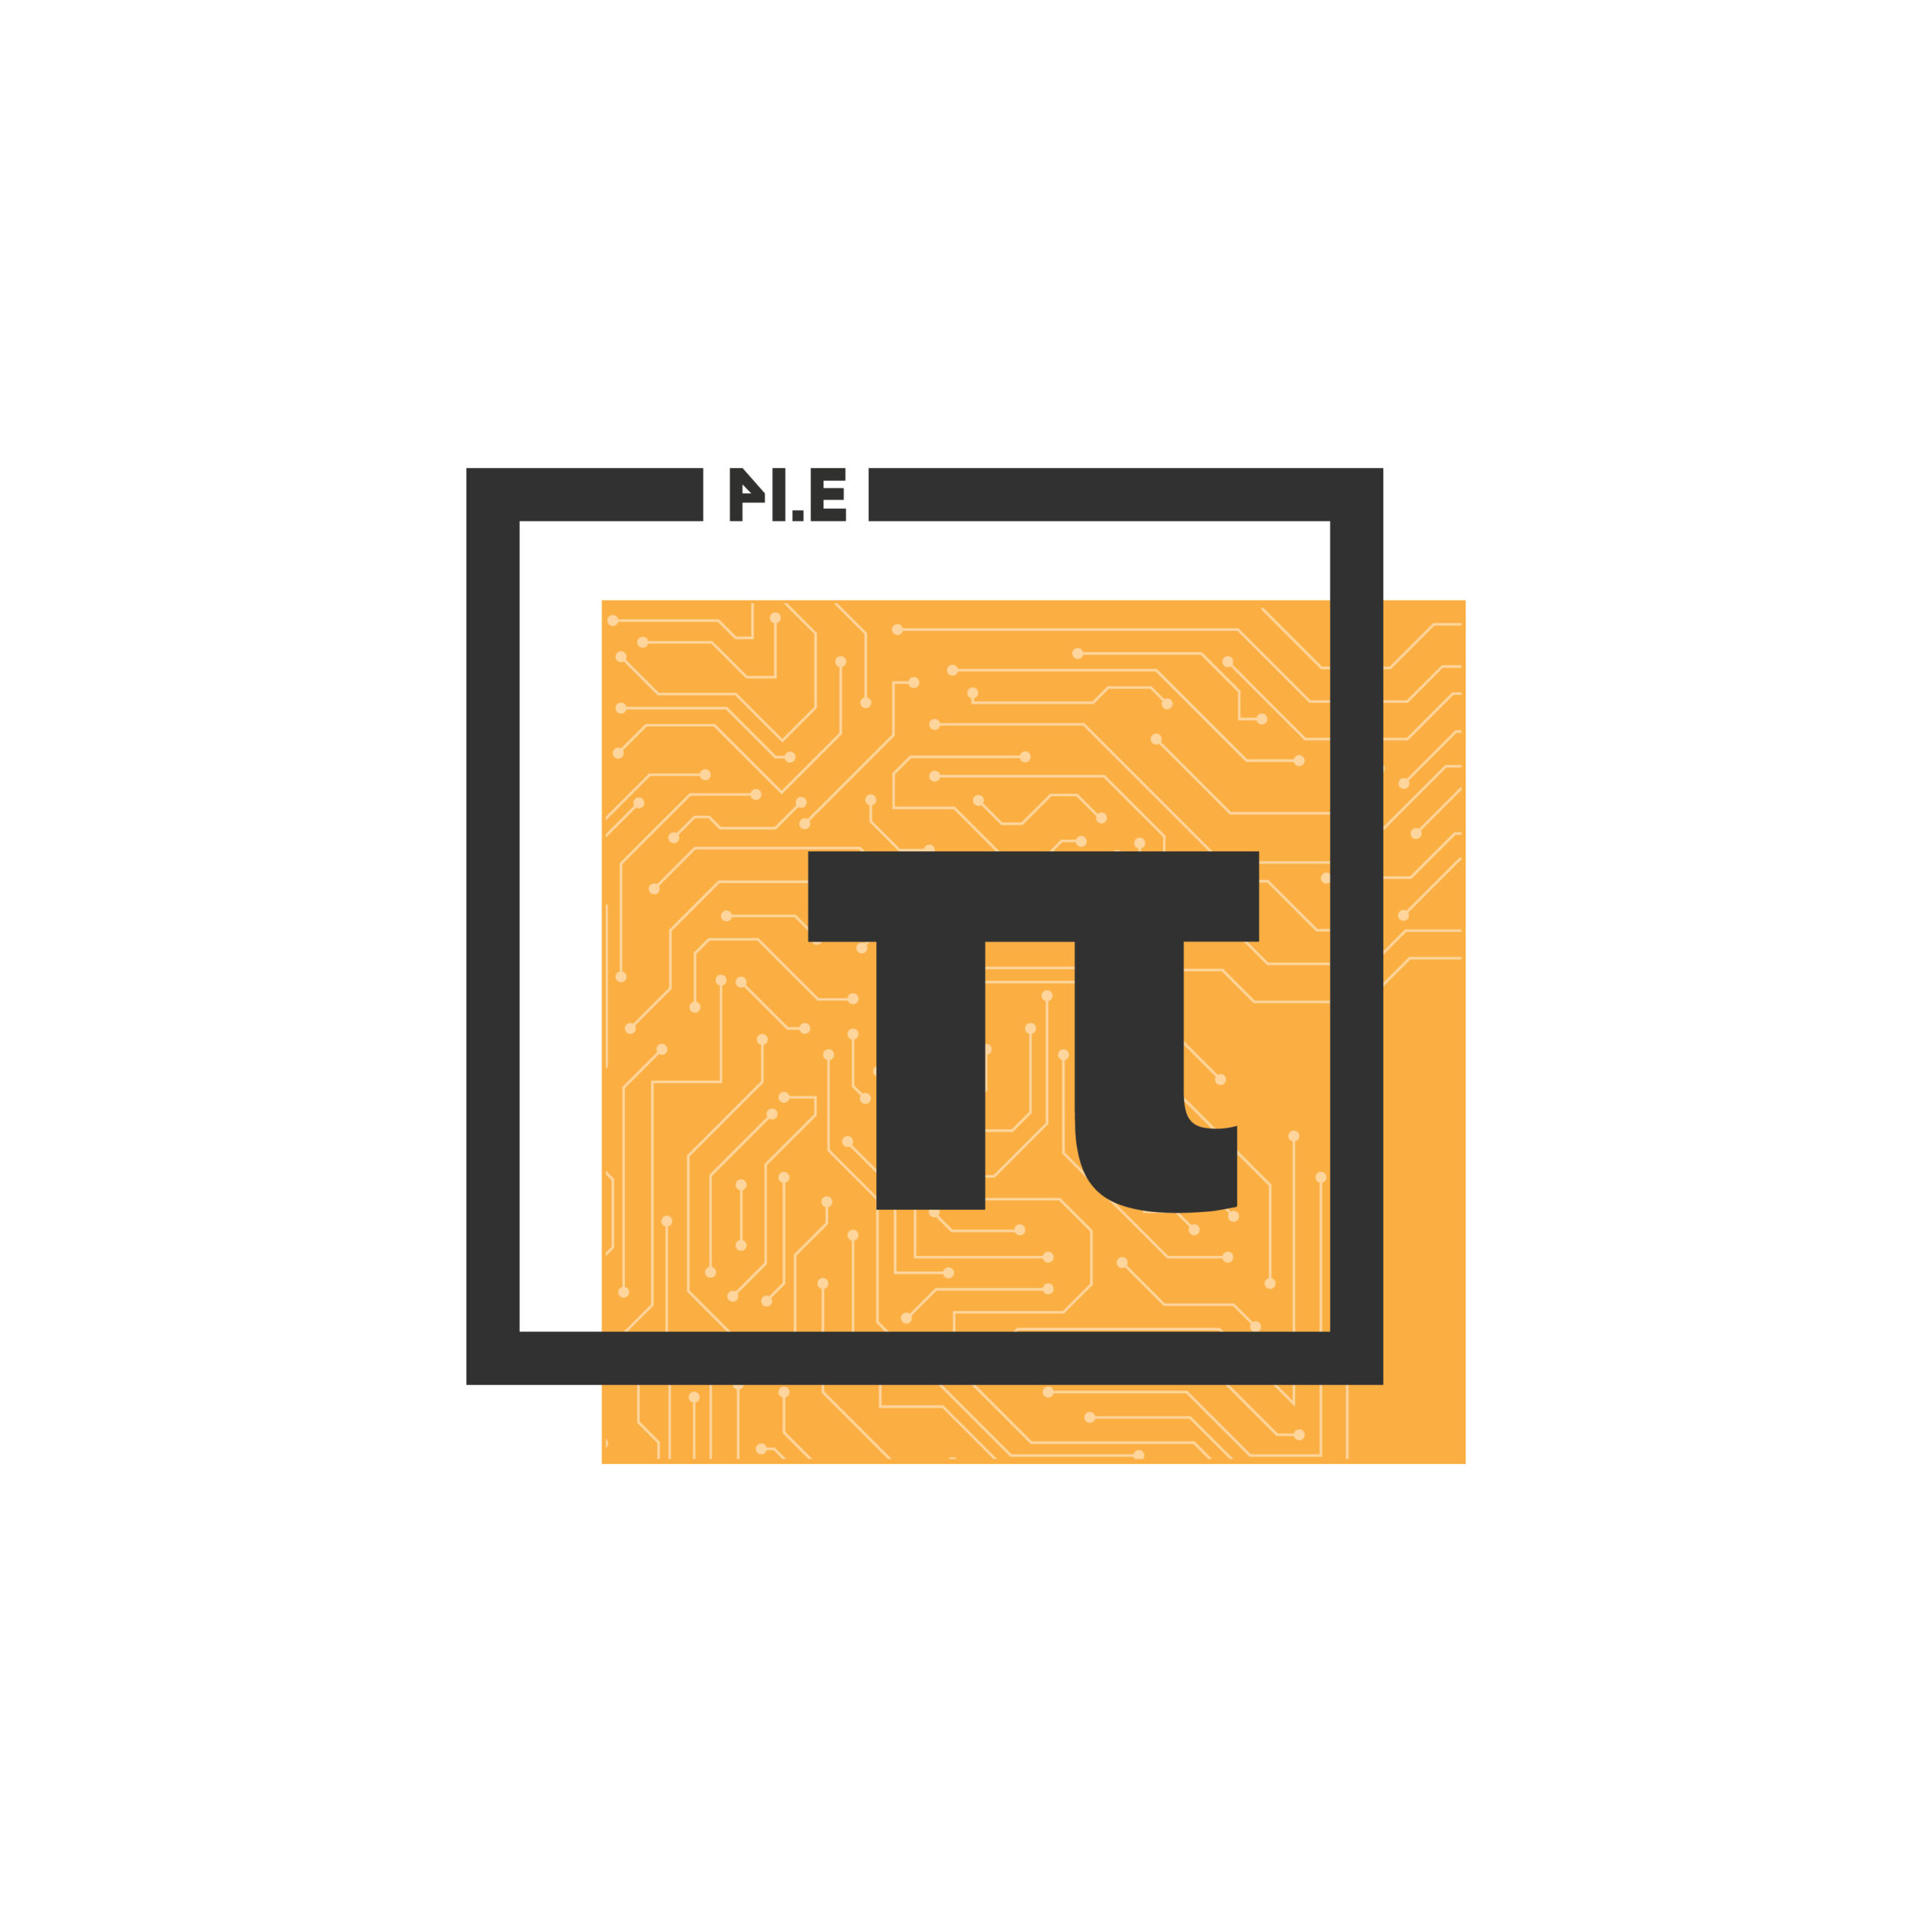 Pie-Solutions